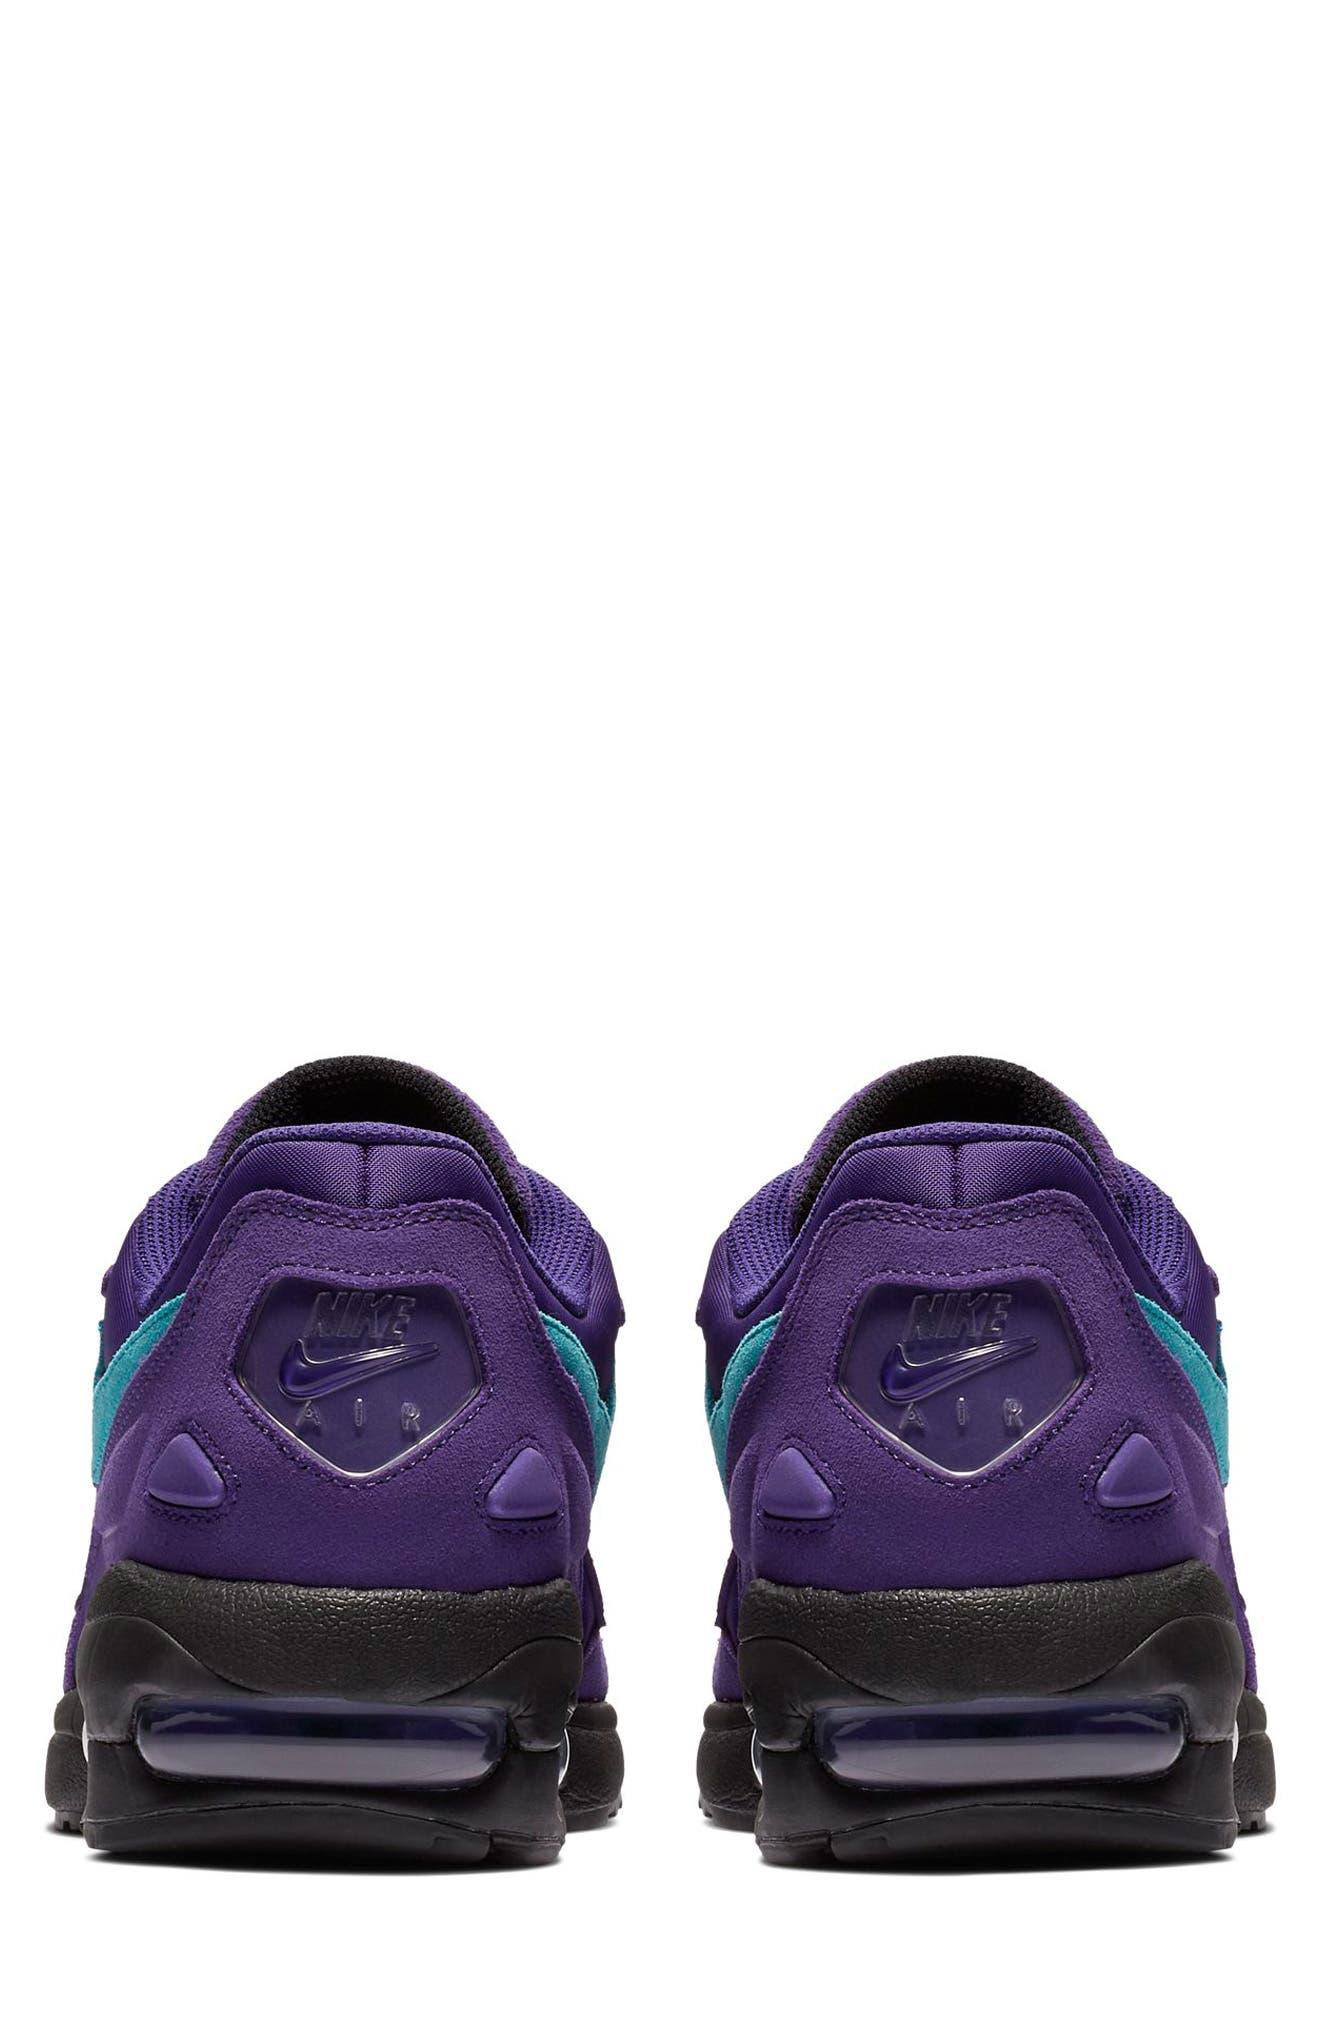 NIKE, Air Max2 Light Sneaker, Alternate thumbnail 2, color, PURPLE/ TEAL/ BLACK/ WHITE